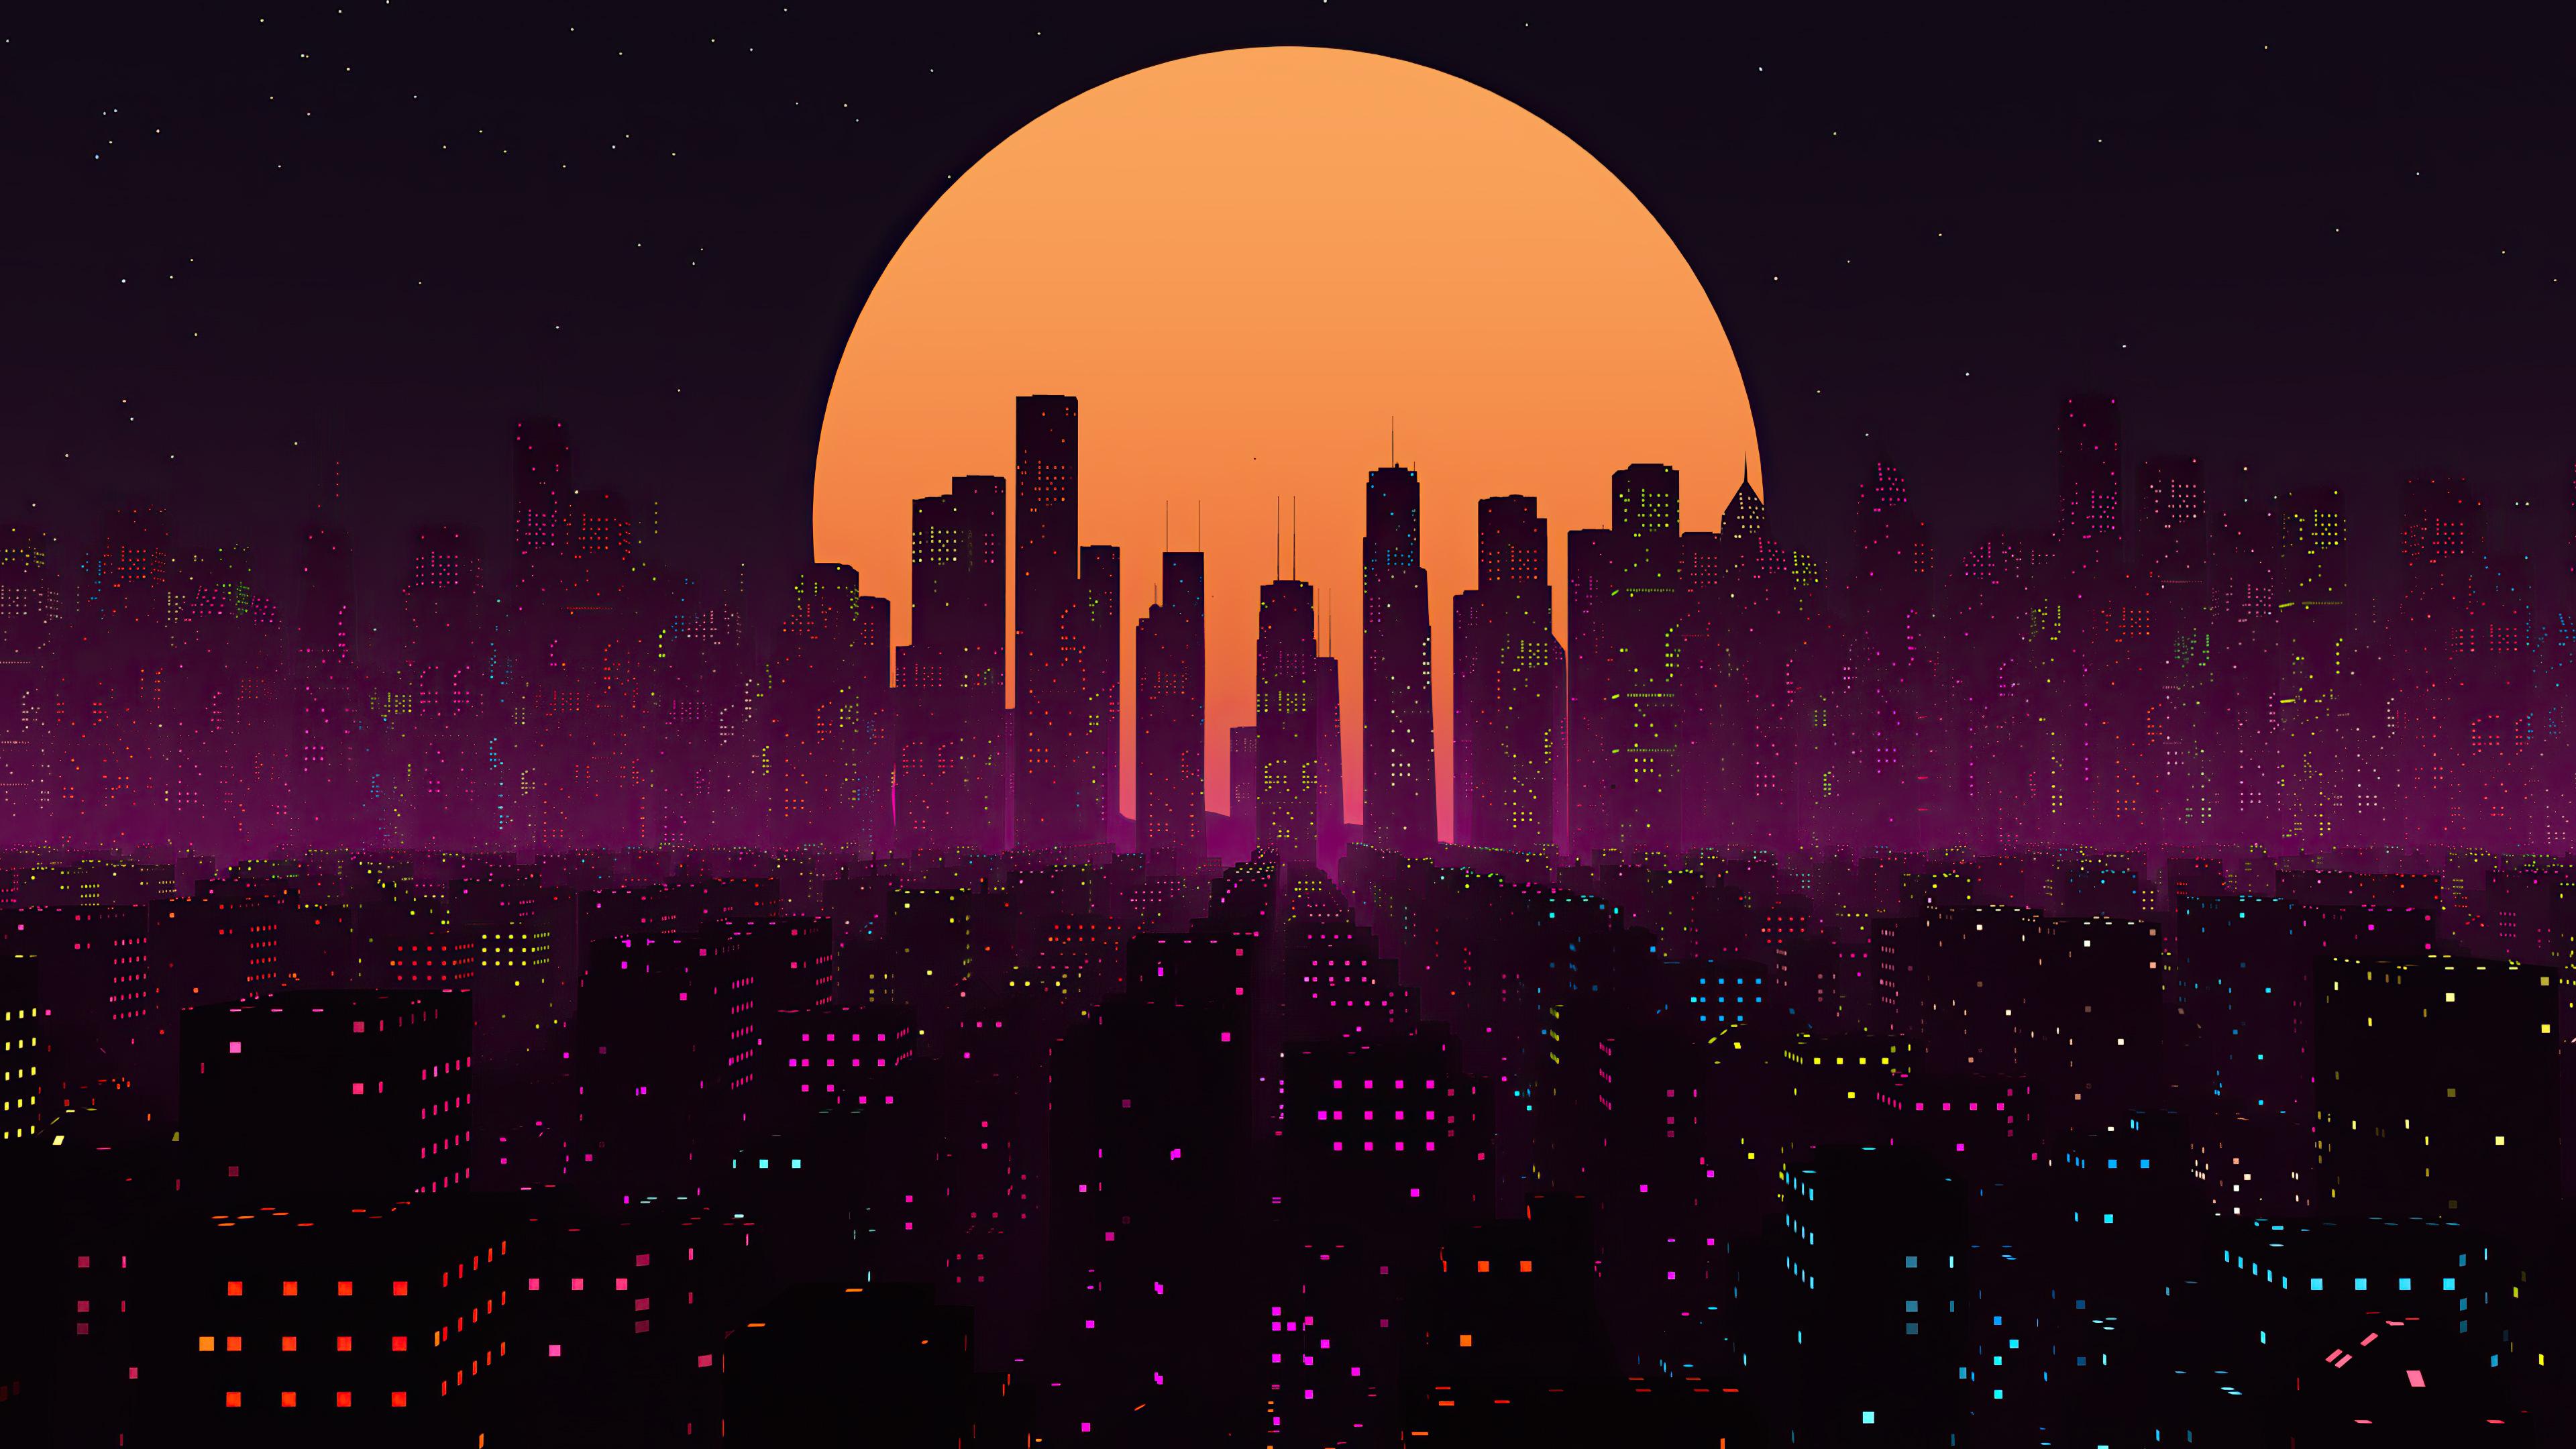 retrowave-city-sunset-4k-8f.jpg